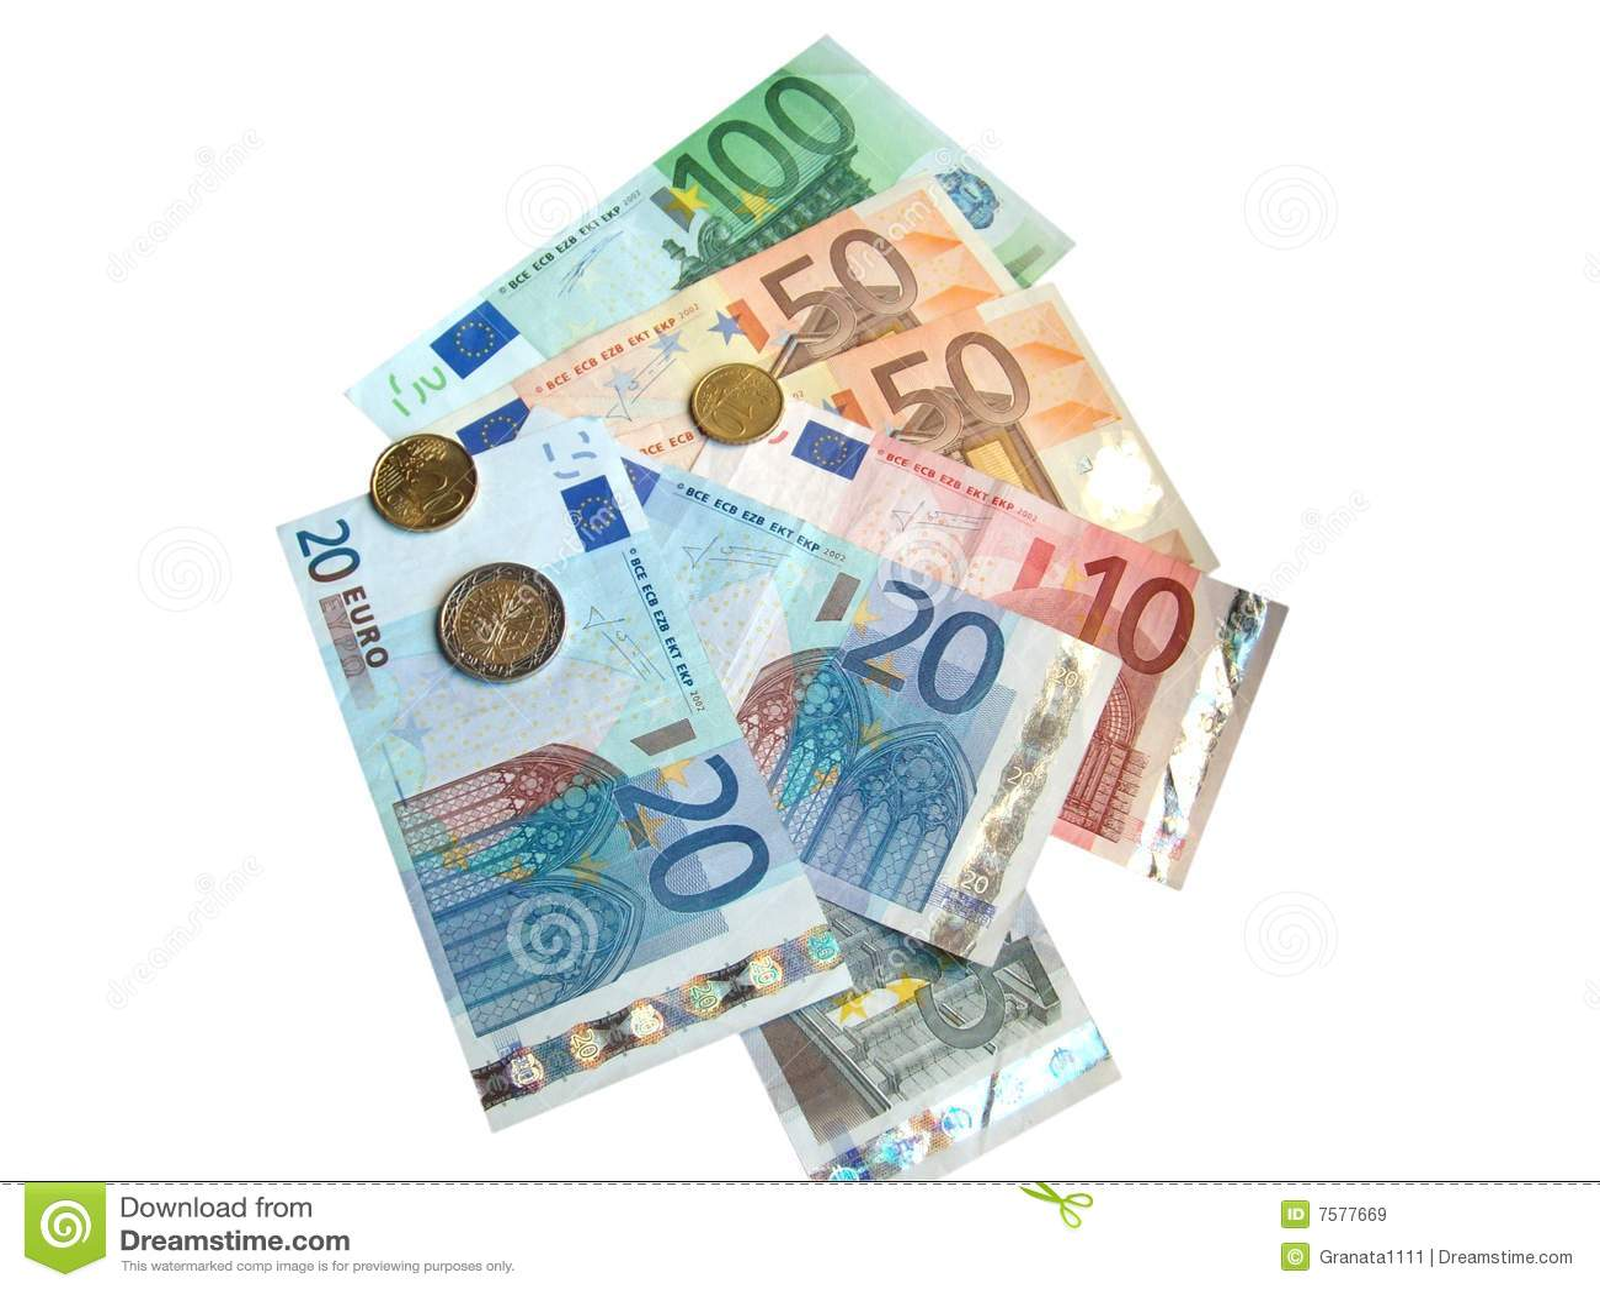 Euro coins and euro banknotes on white